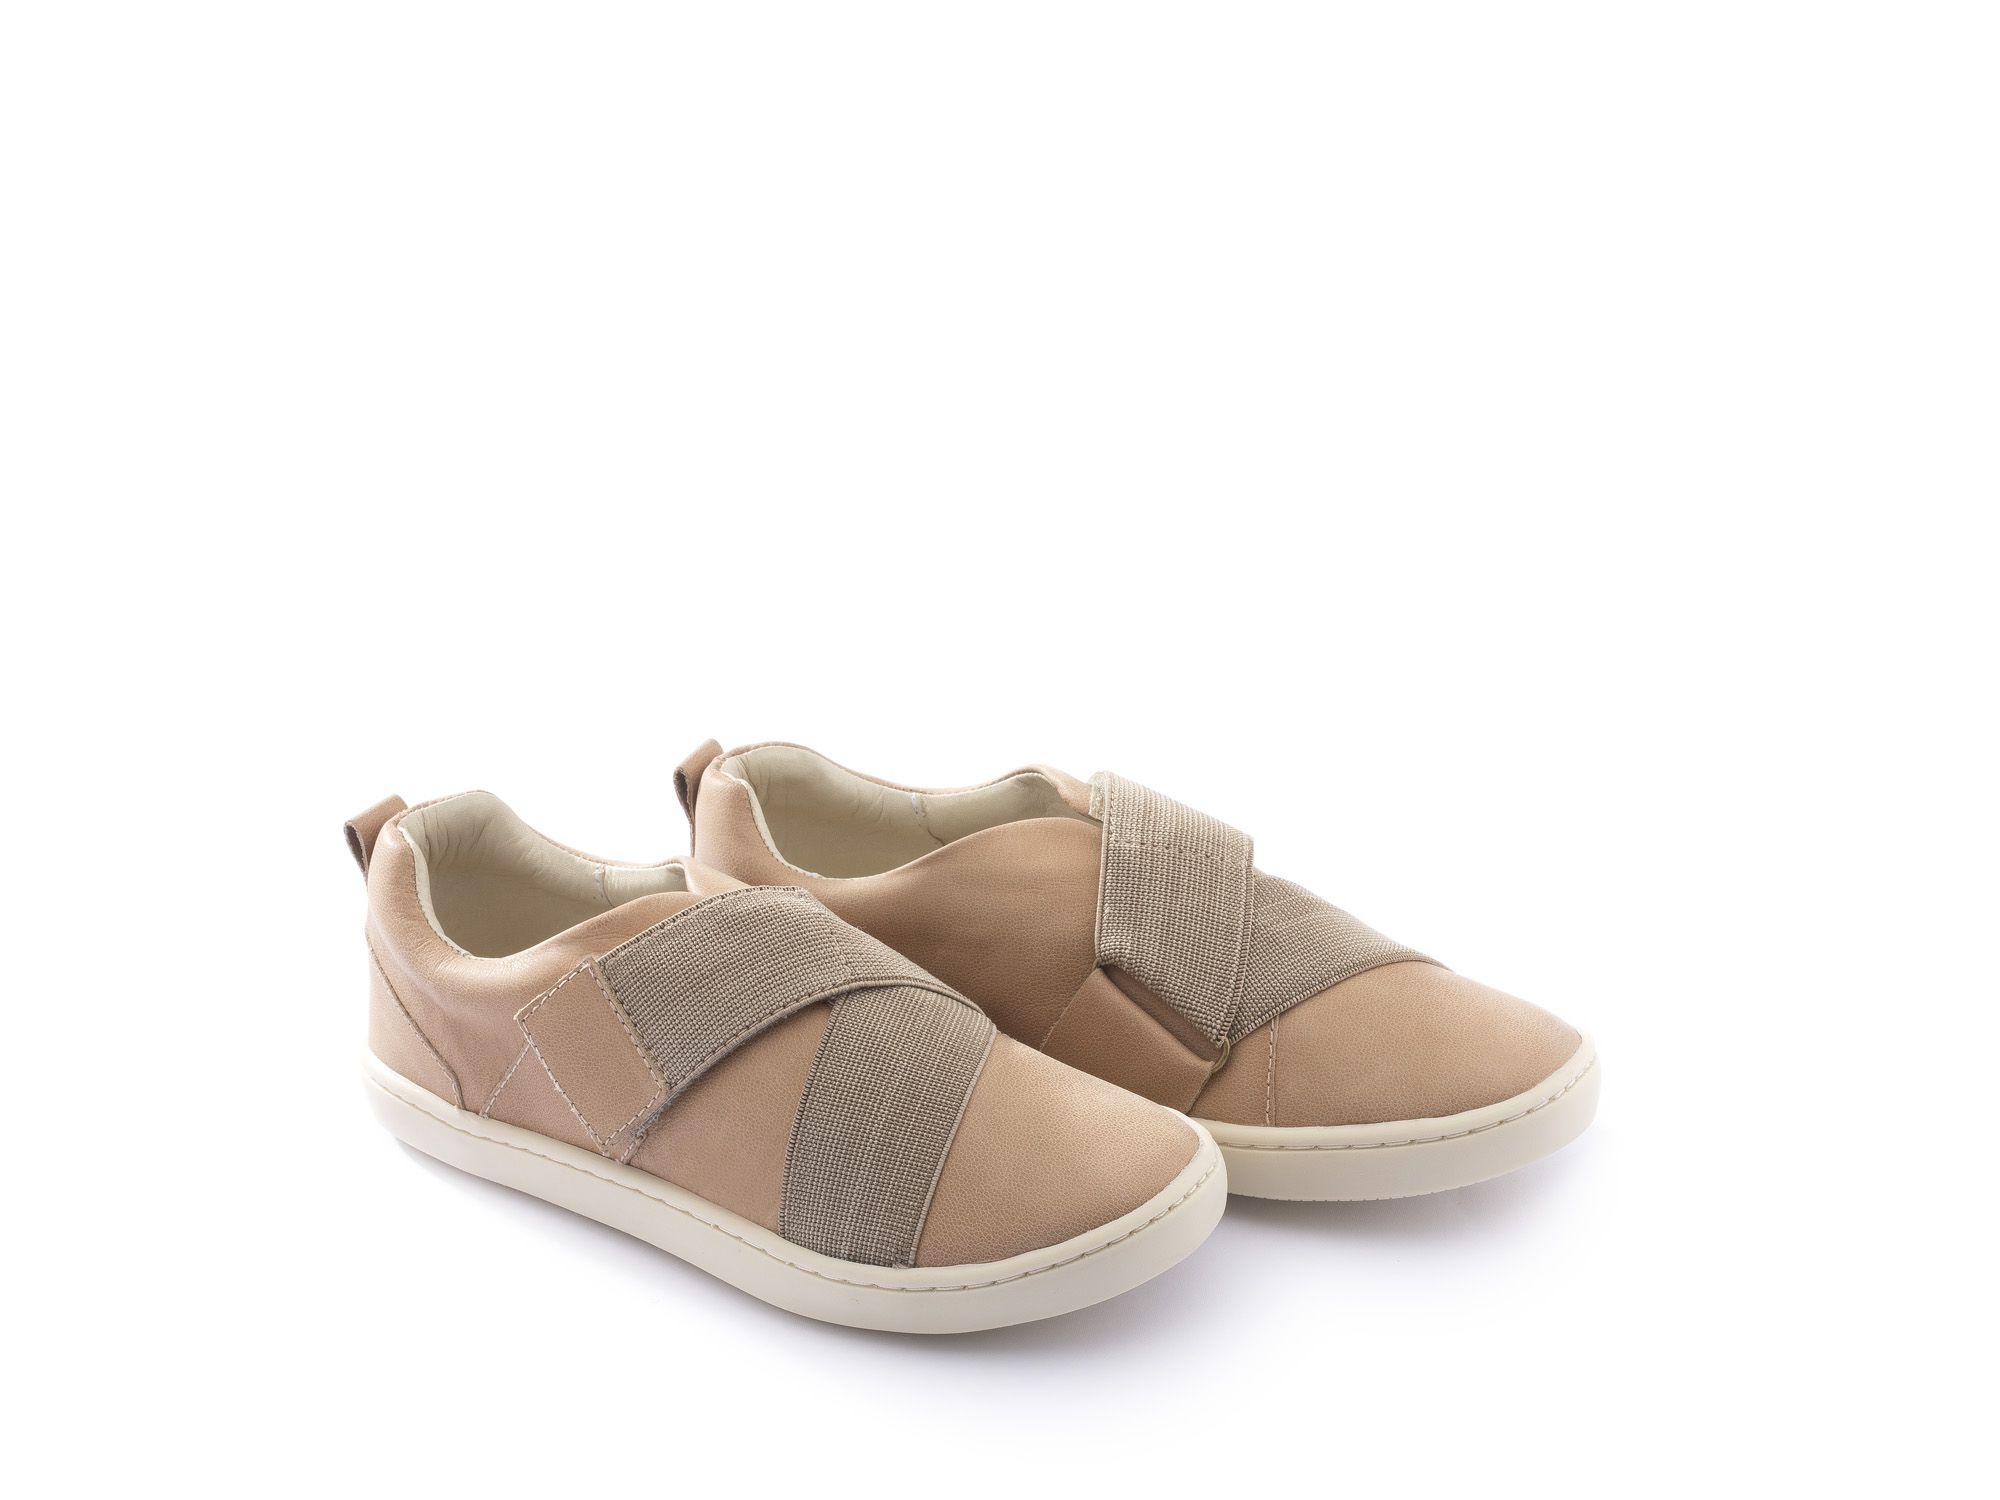 Sapato Couro Caramelo J Zag Tip Toey Joey